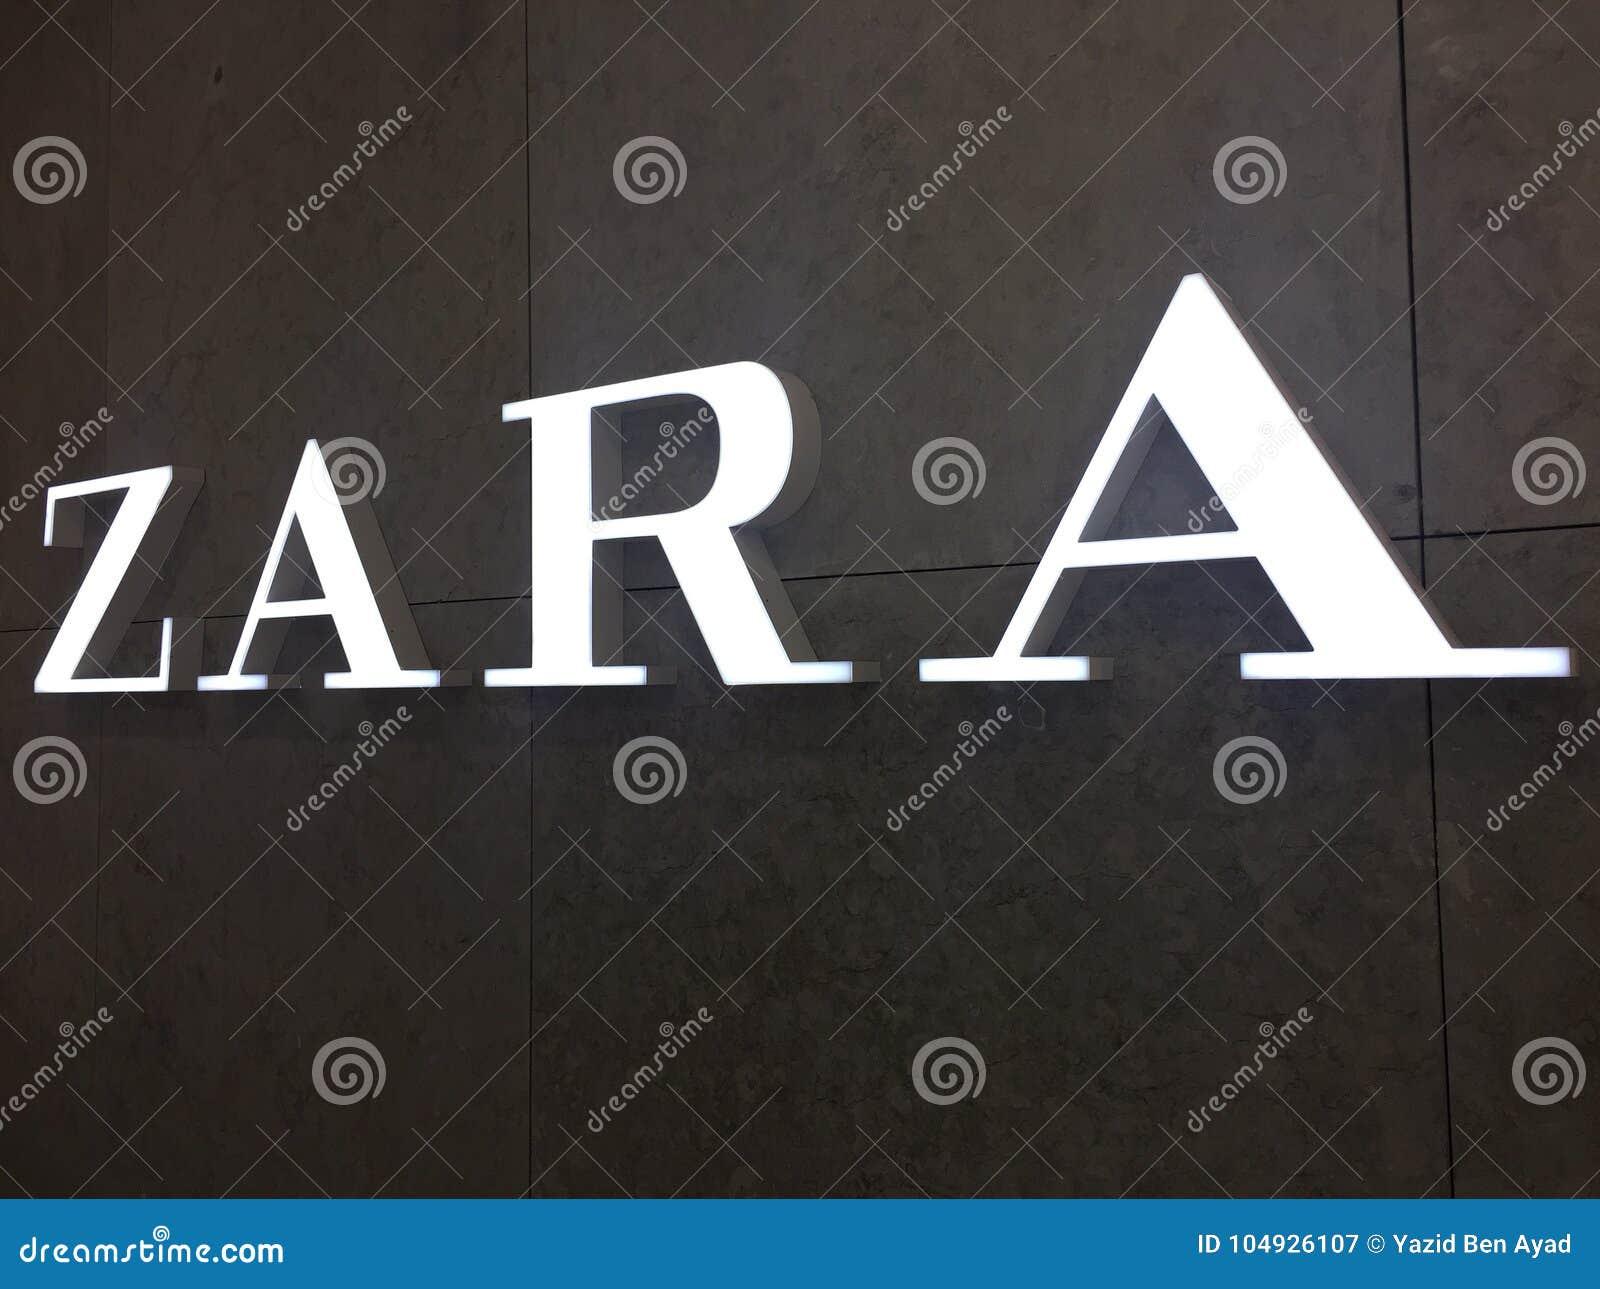 Zara Brand Editorial Photography Image Of Apparel Shop 104926107